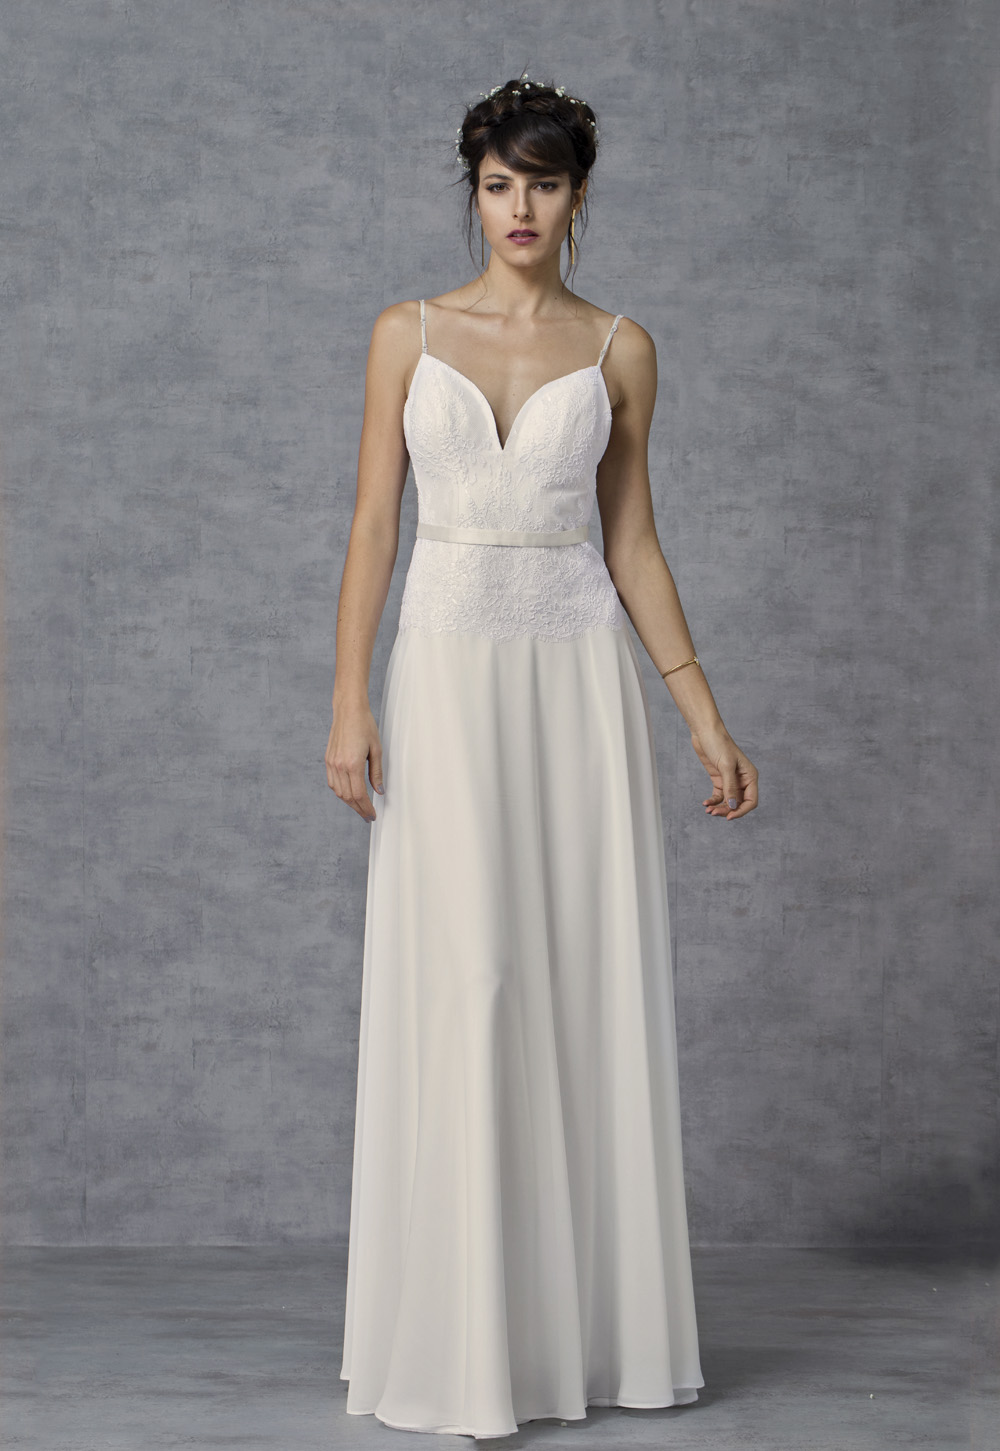 I3A8960 שמלות כלה - שמלה